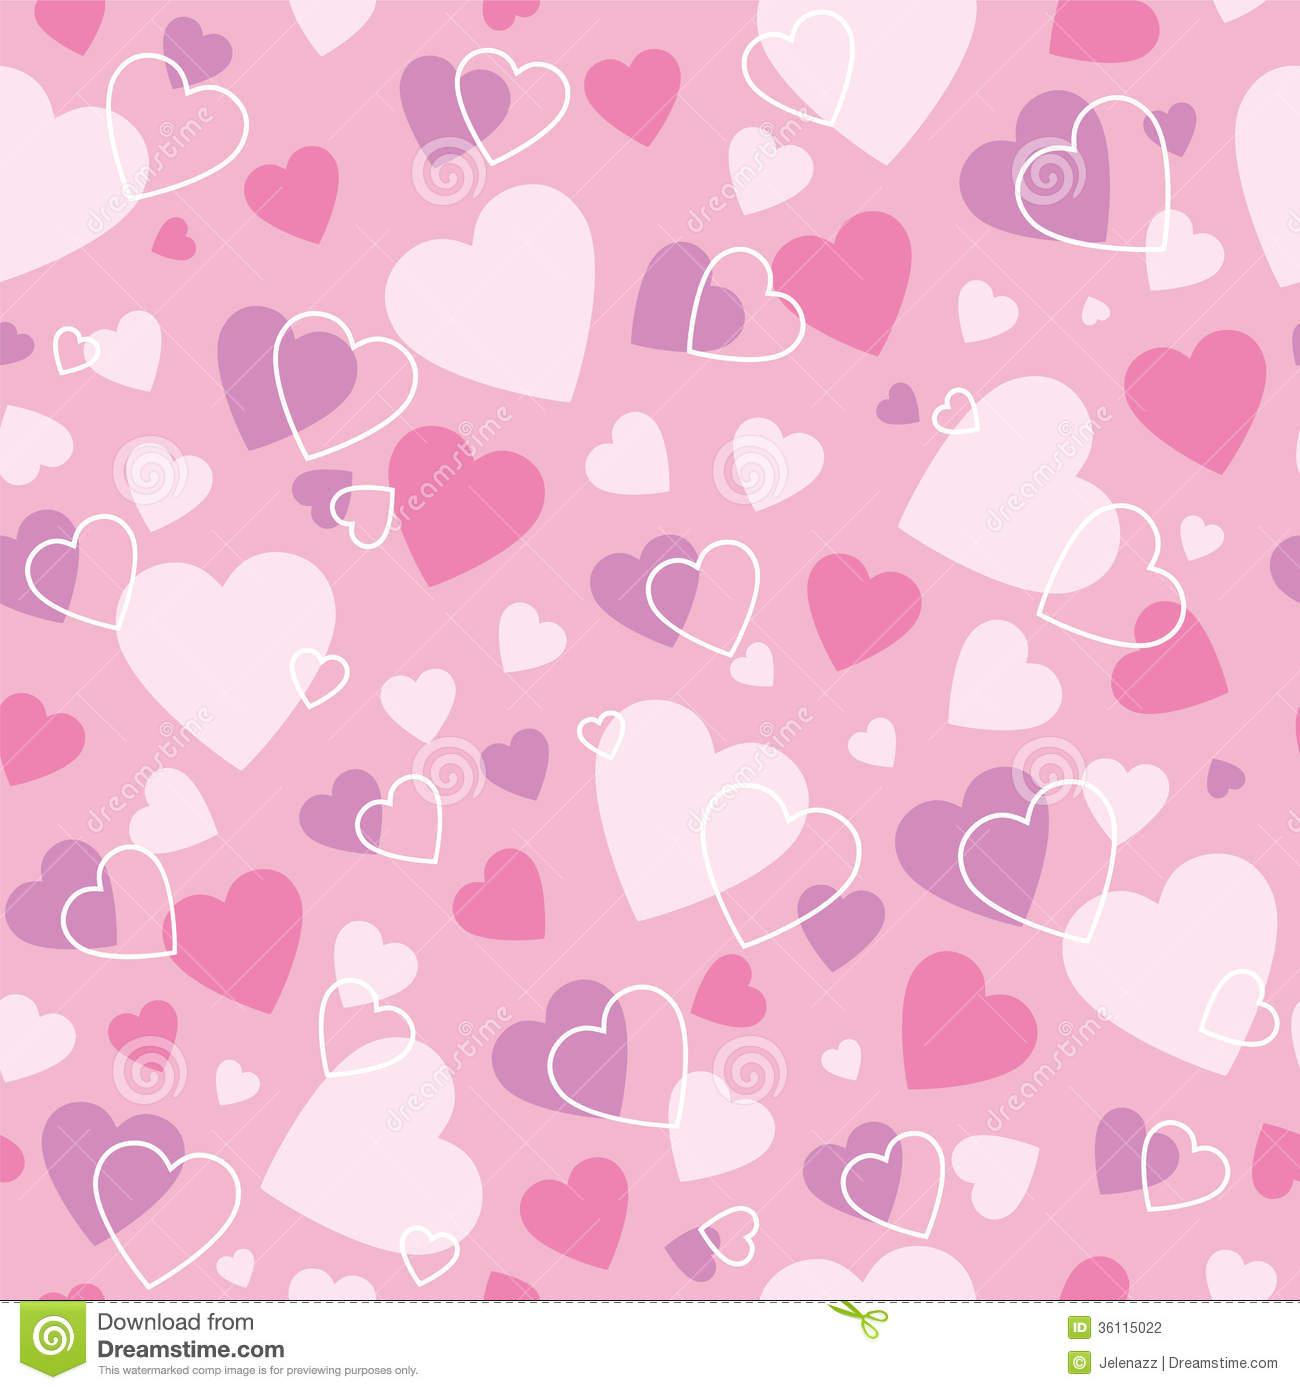 Free download Cute Pink Heart Wallpaper Pretty pink he